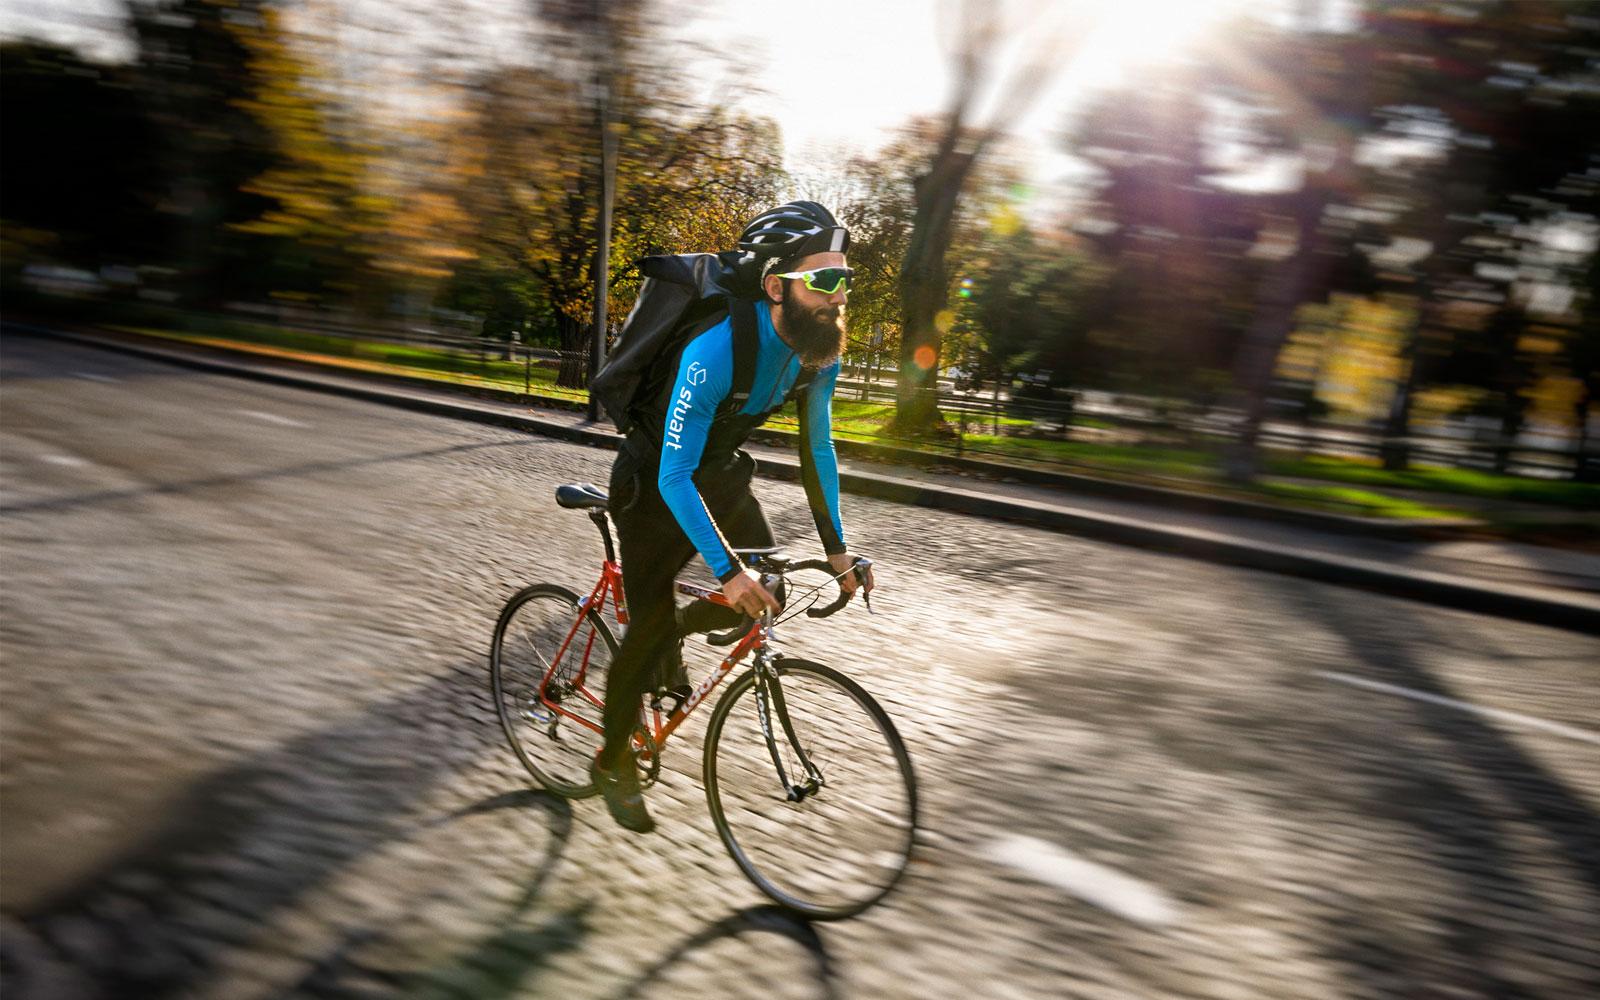 Comida vegana y vegetariana que llega a tu casa en bicicleta